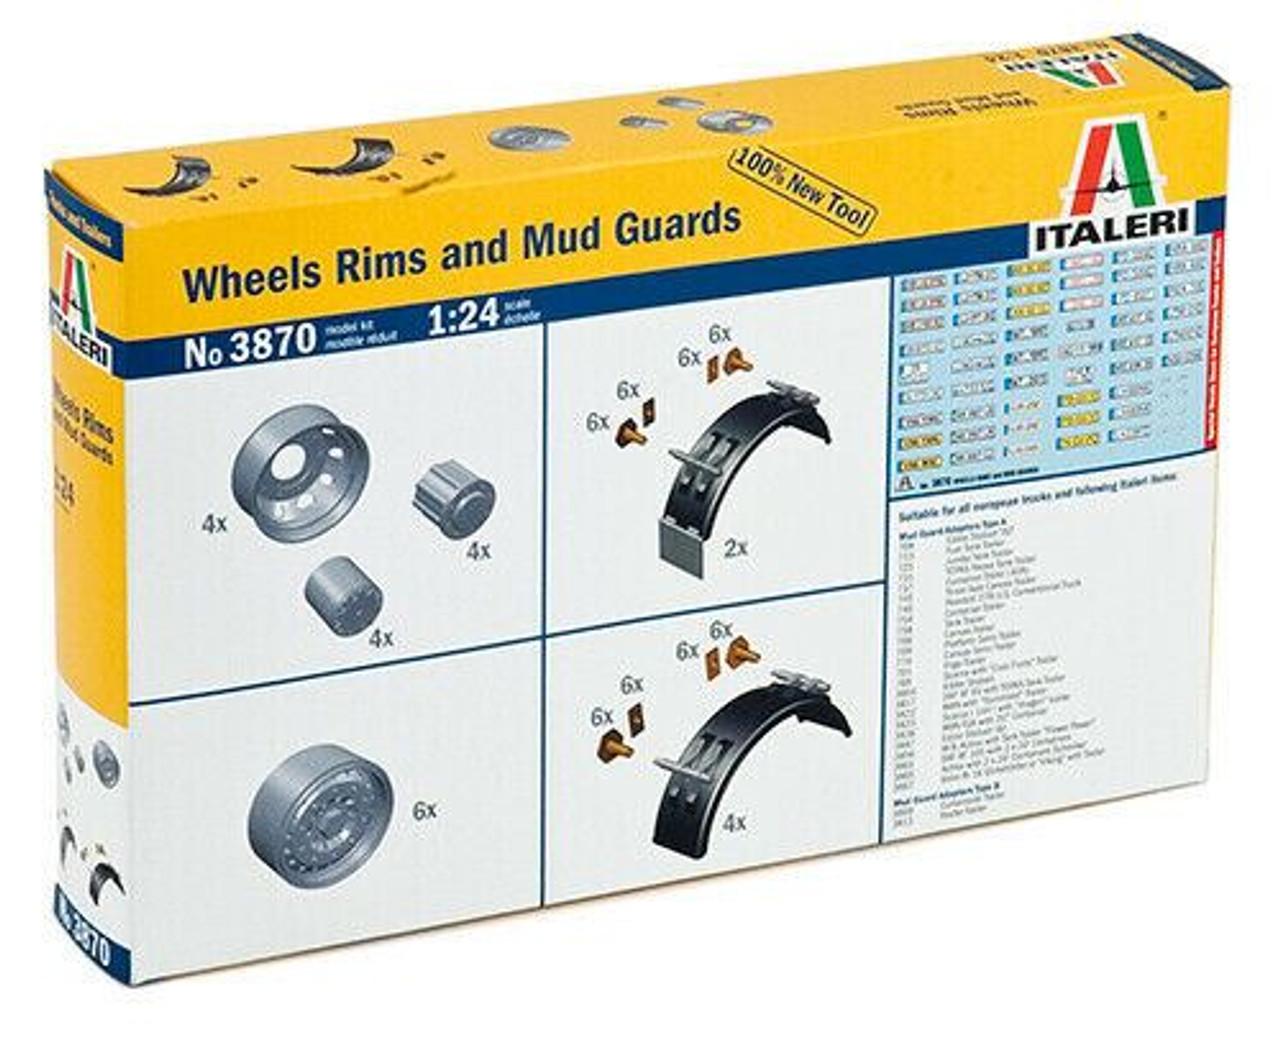 Italeri 1:24 3870 Wheels Rims and mud guards